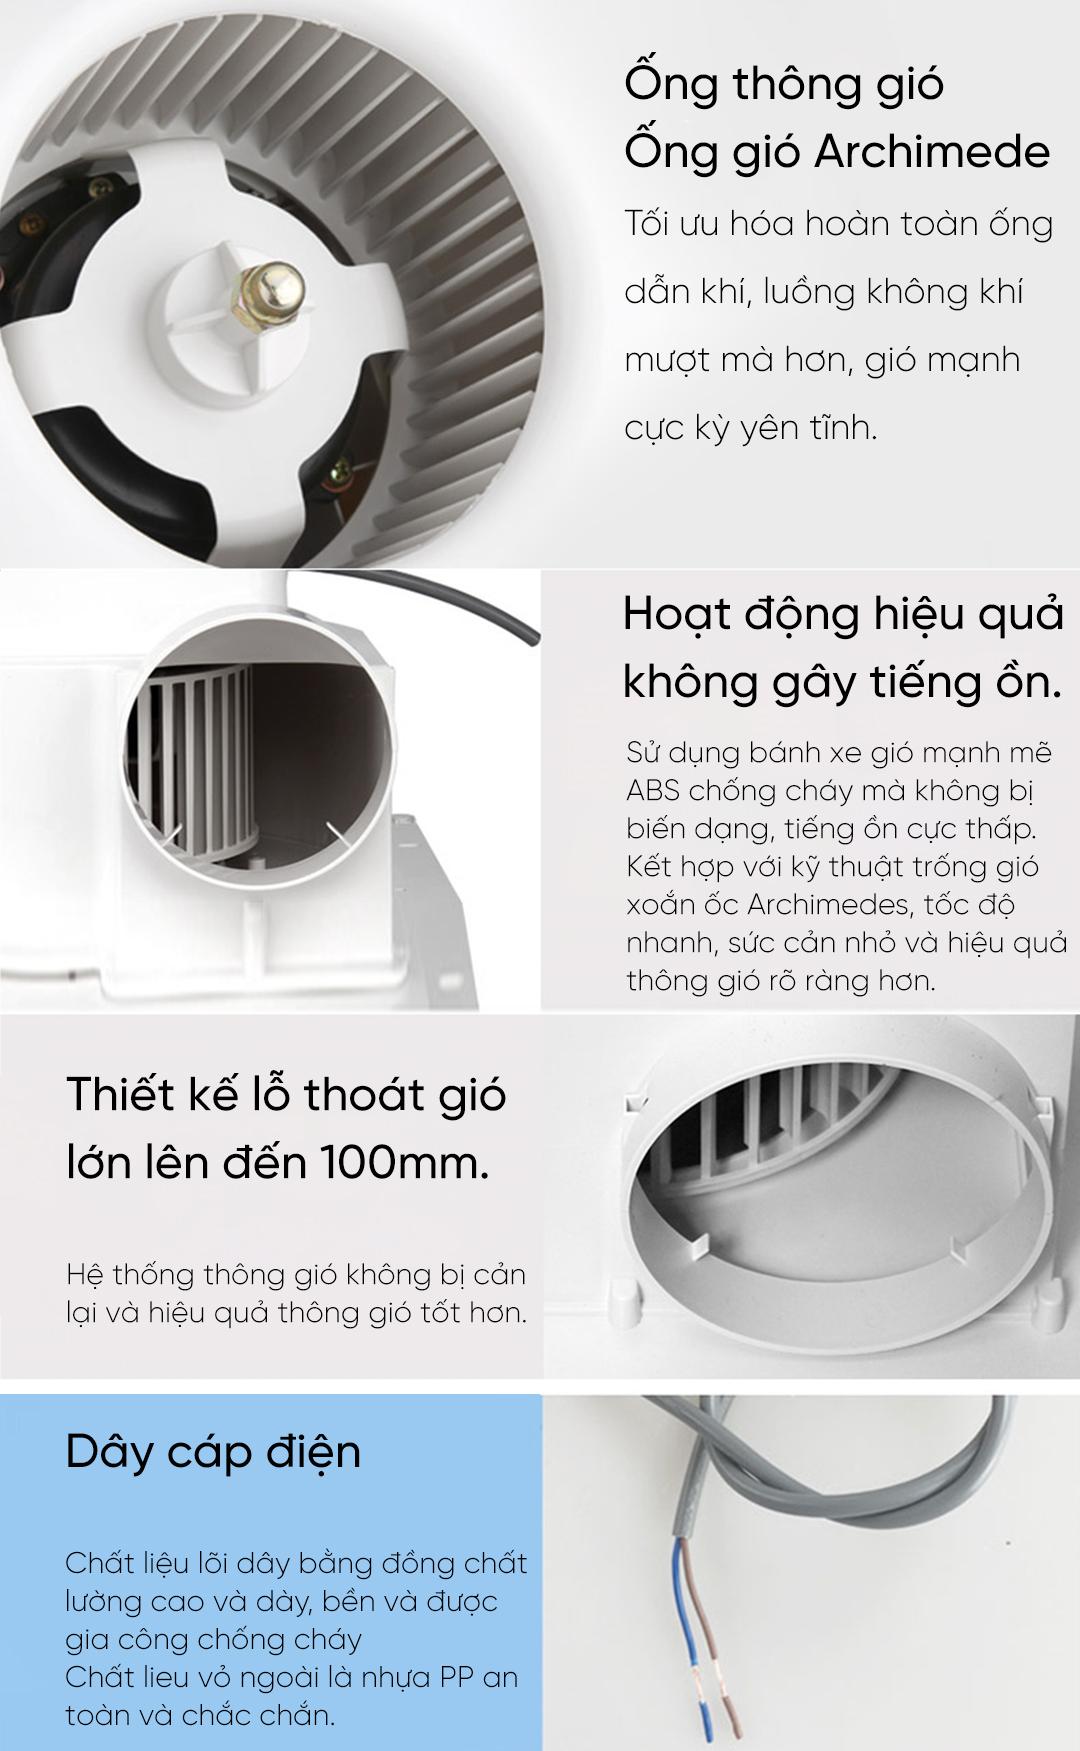 quat-thong-gio-legrand-230-250-01 (10)